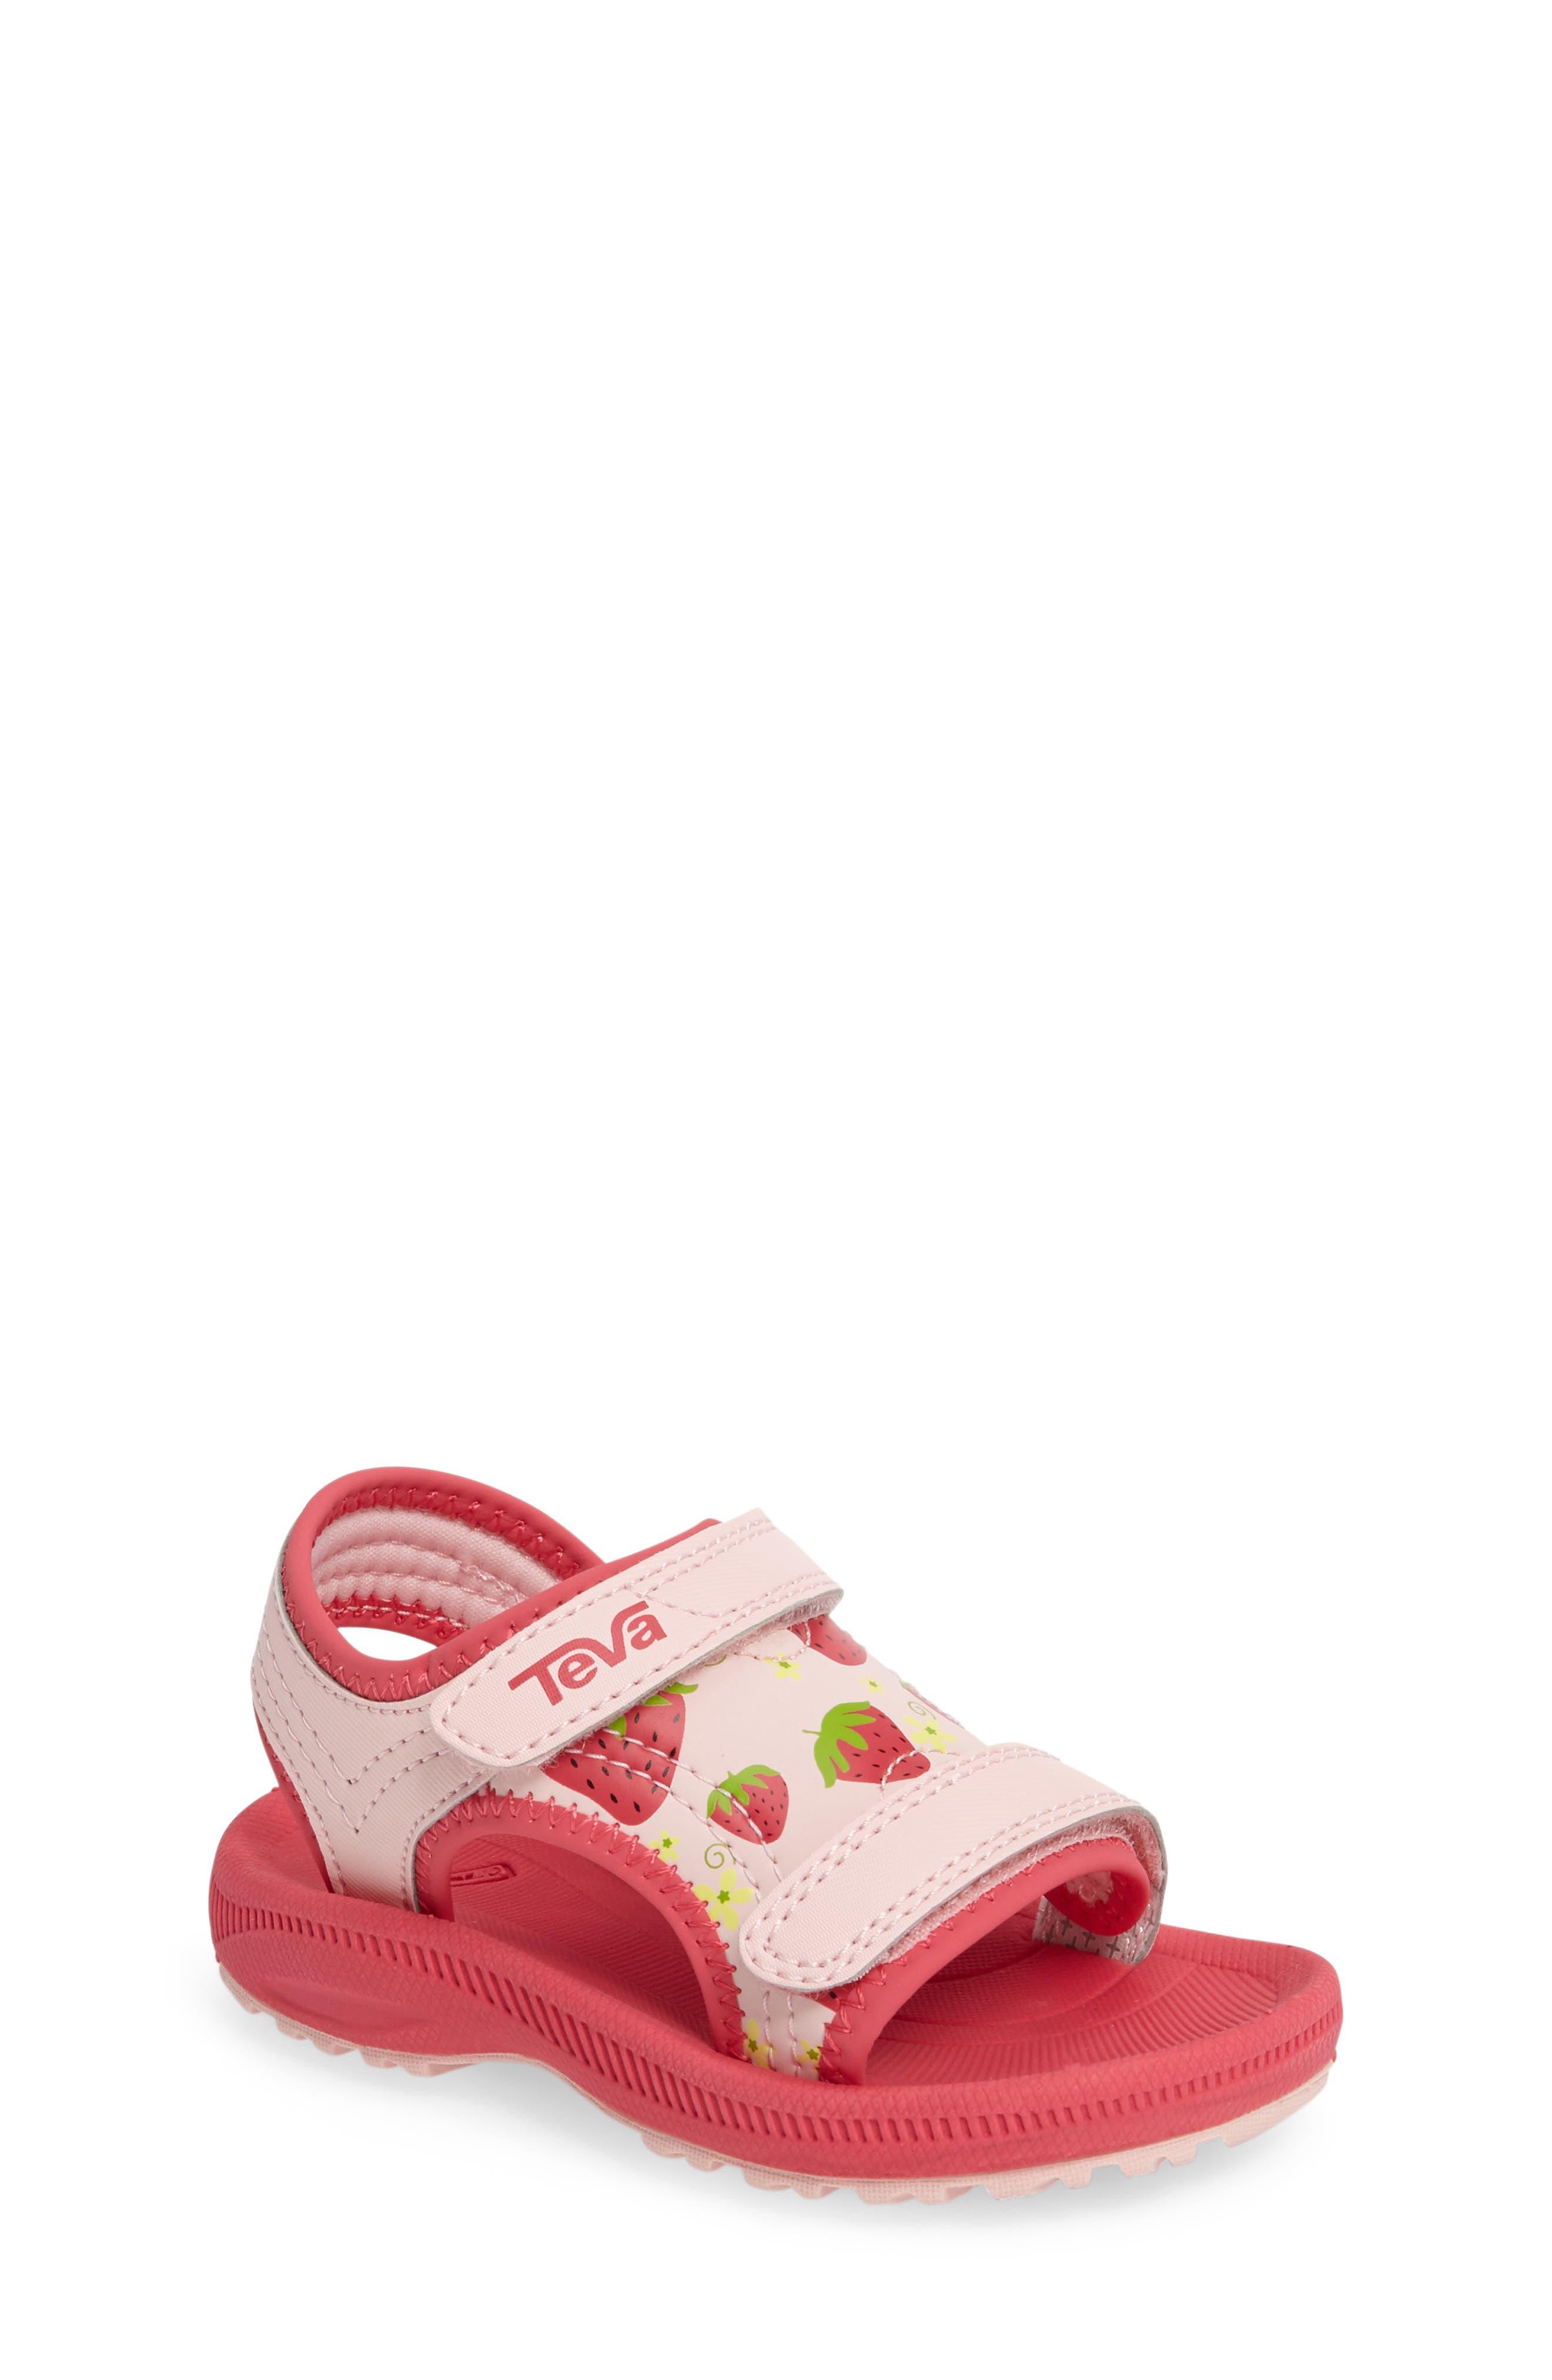 TEVA Psyclone 4 Strawberry Sport Sandal